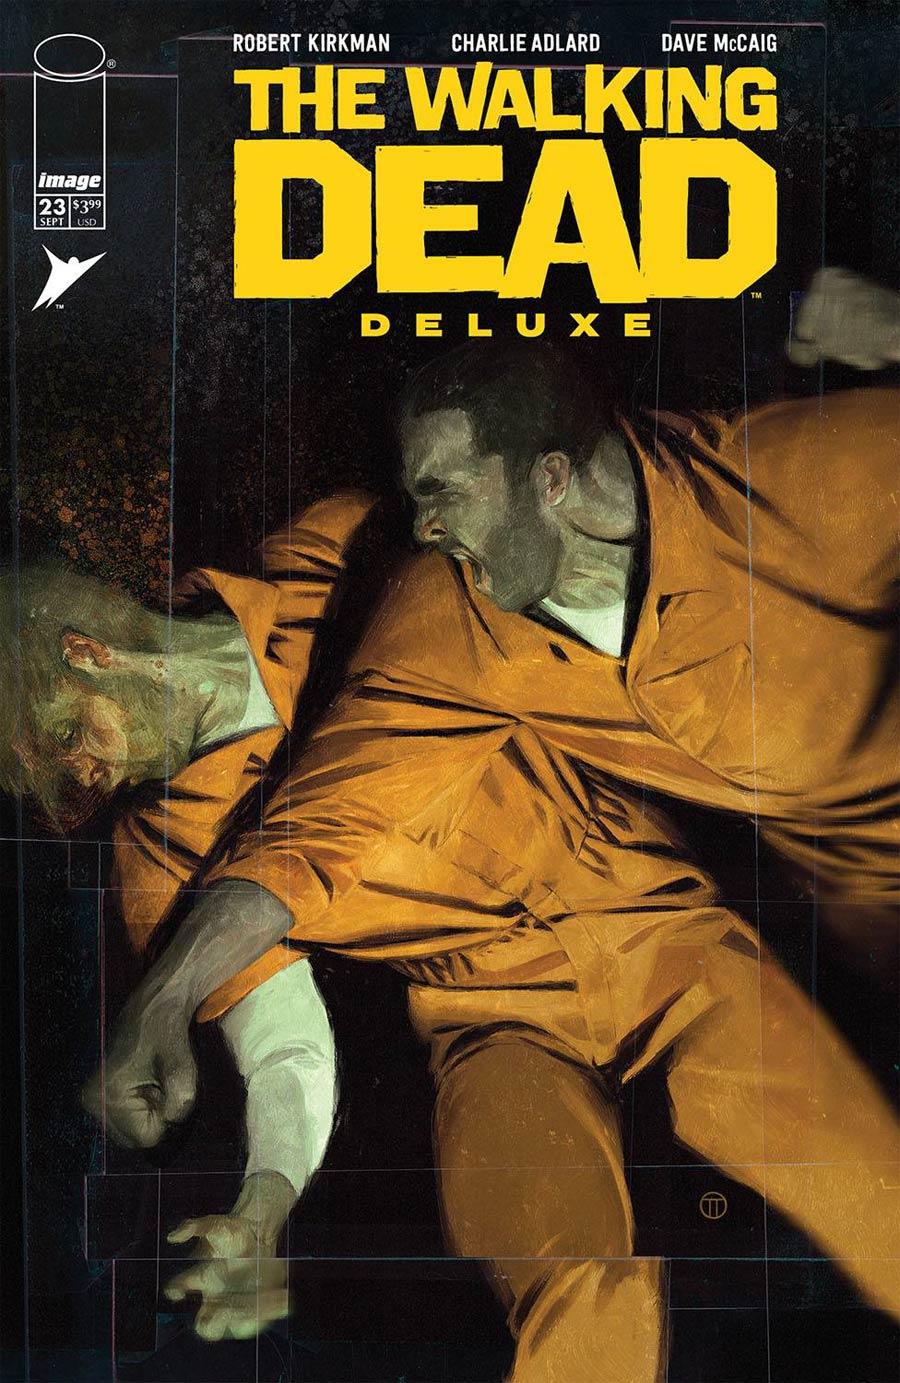 Walking Dead Deluxe #23 Cover C Variant Julian Totino Tedesco Cover